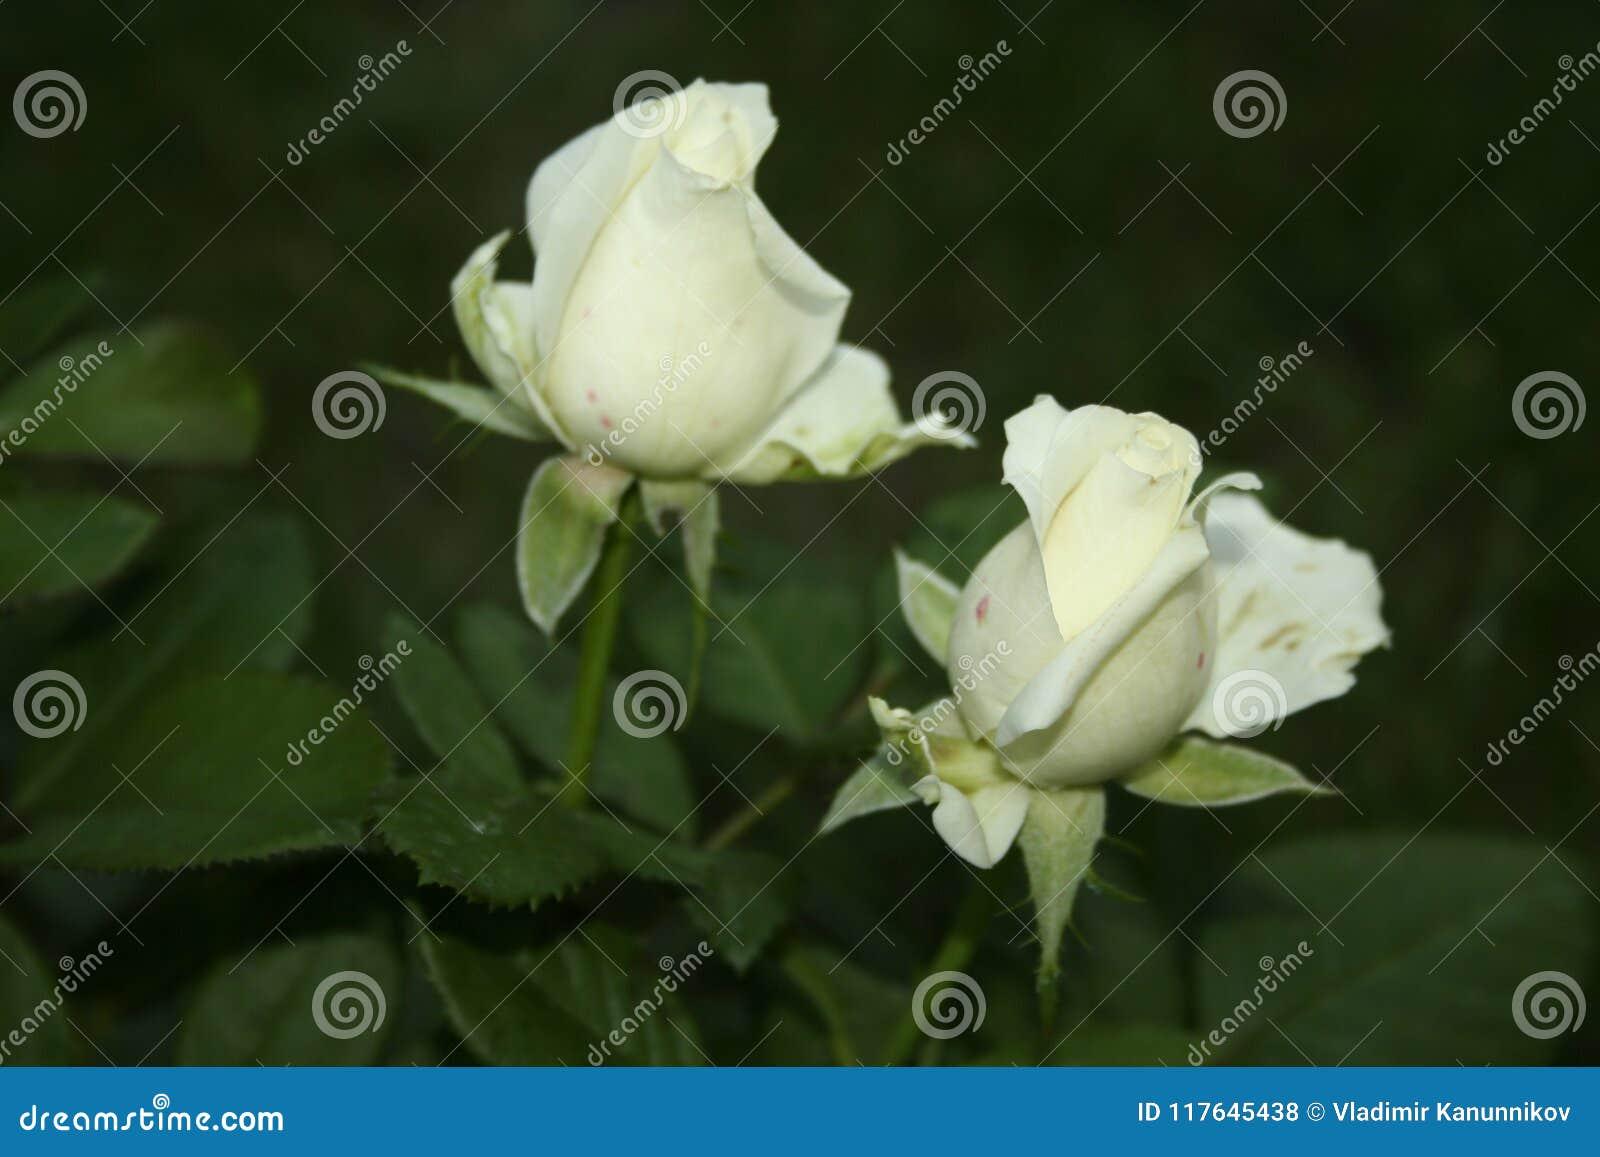 Little White Rose Flowers Stock Photo Image Of White 117645438